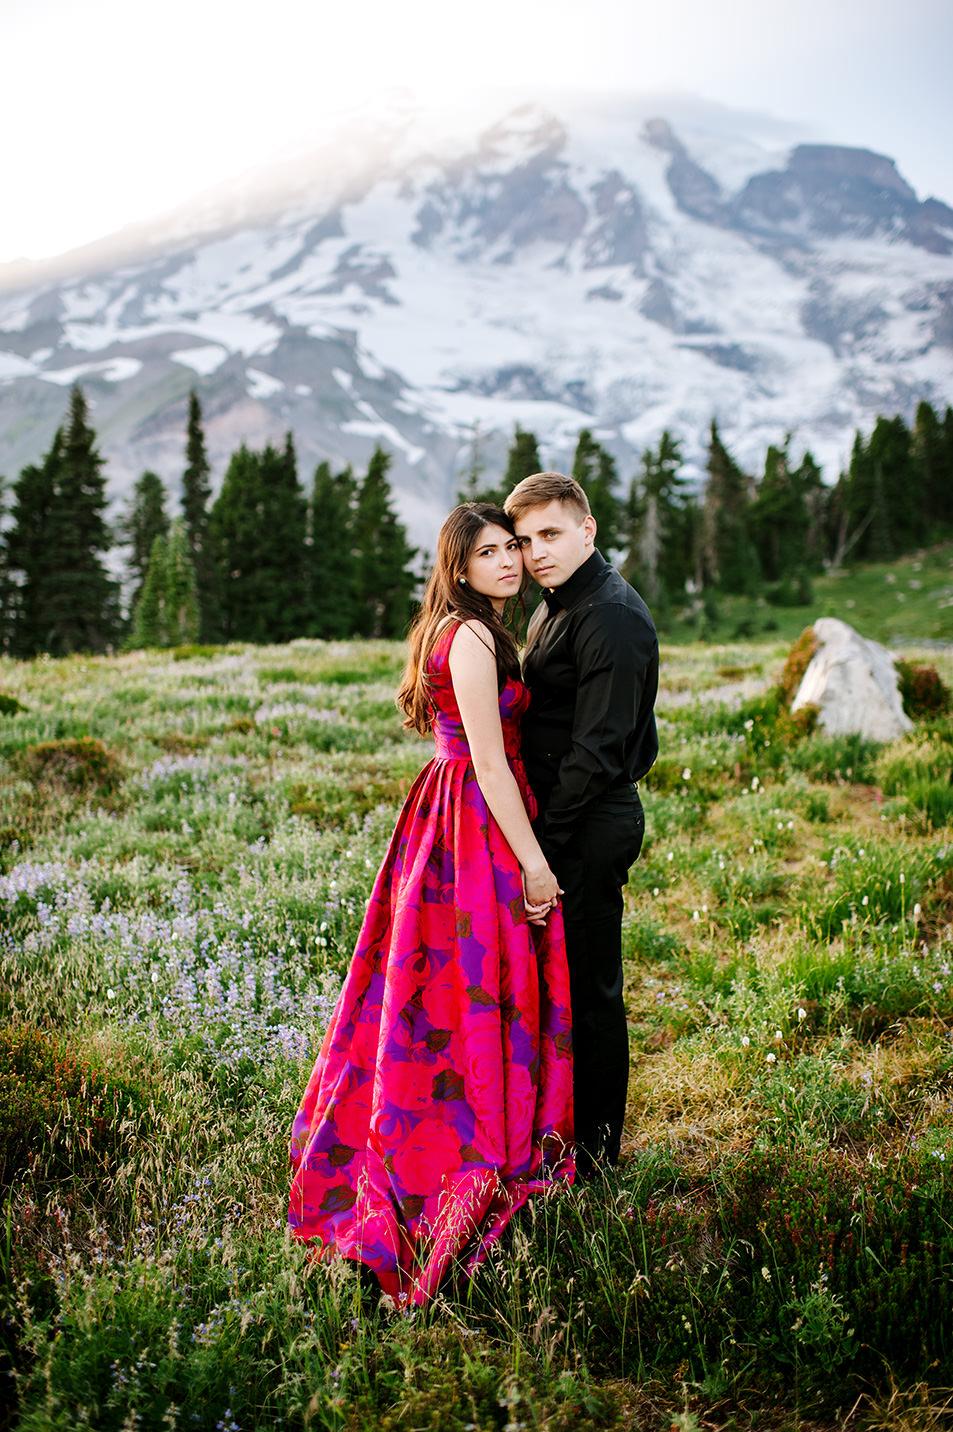 mount-rainier-engagement-photos-portland-wedding-photographer45.jpg